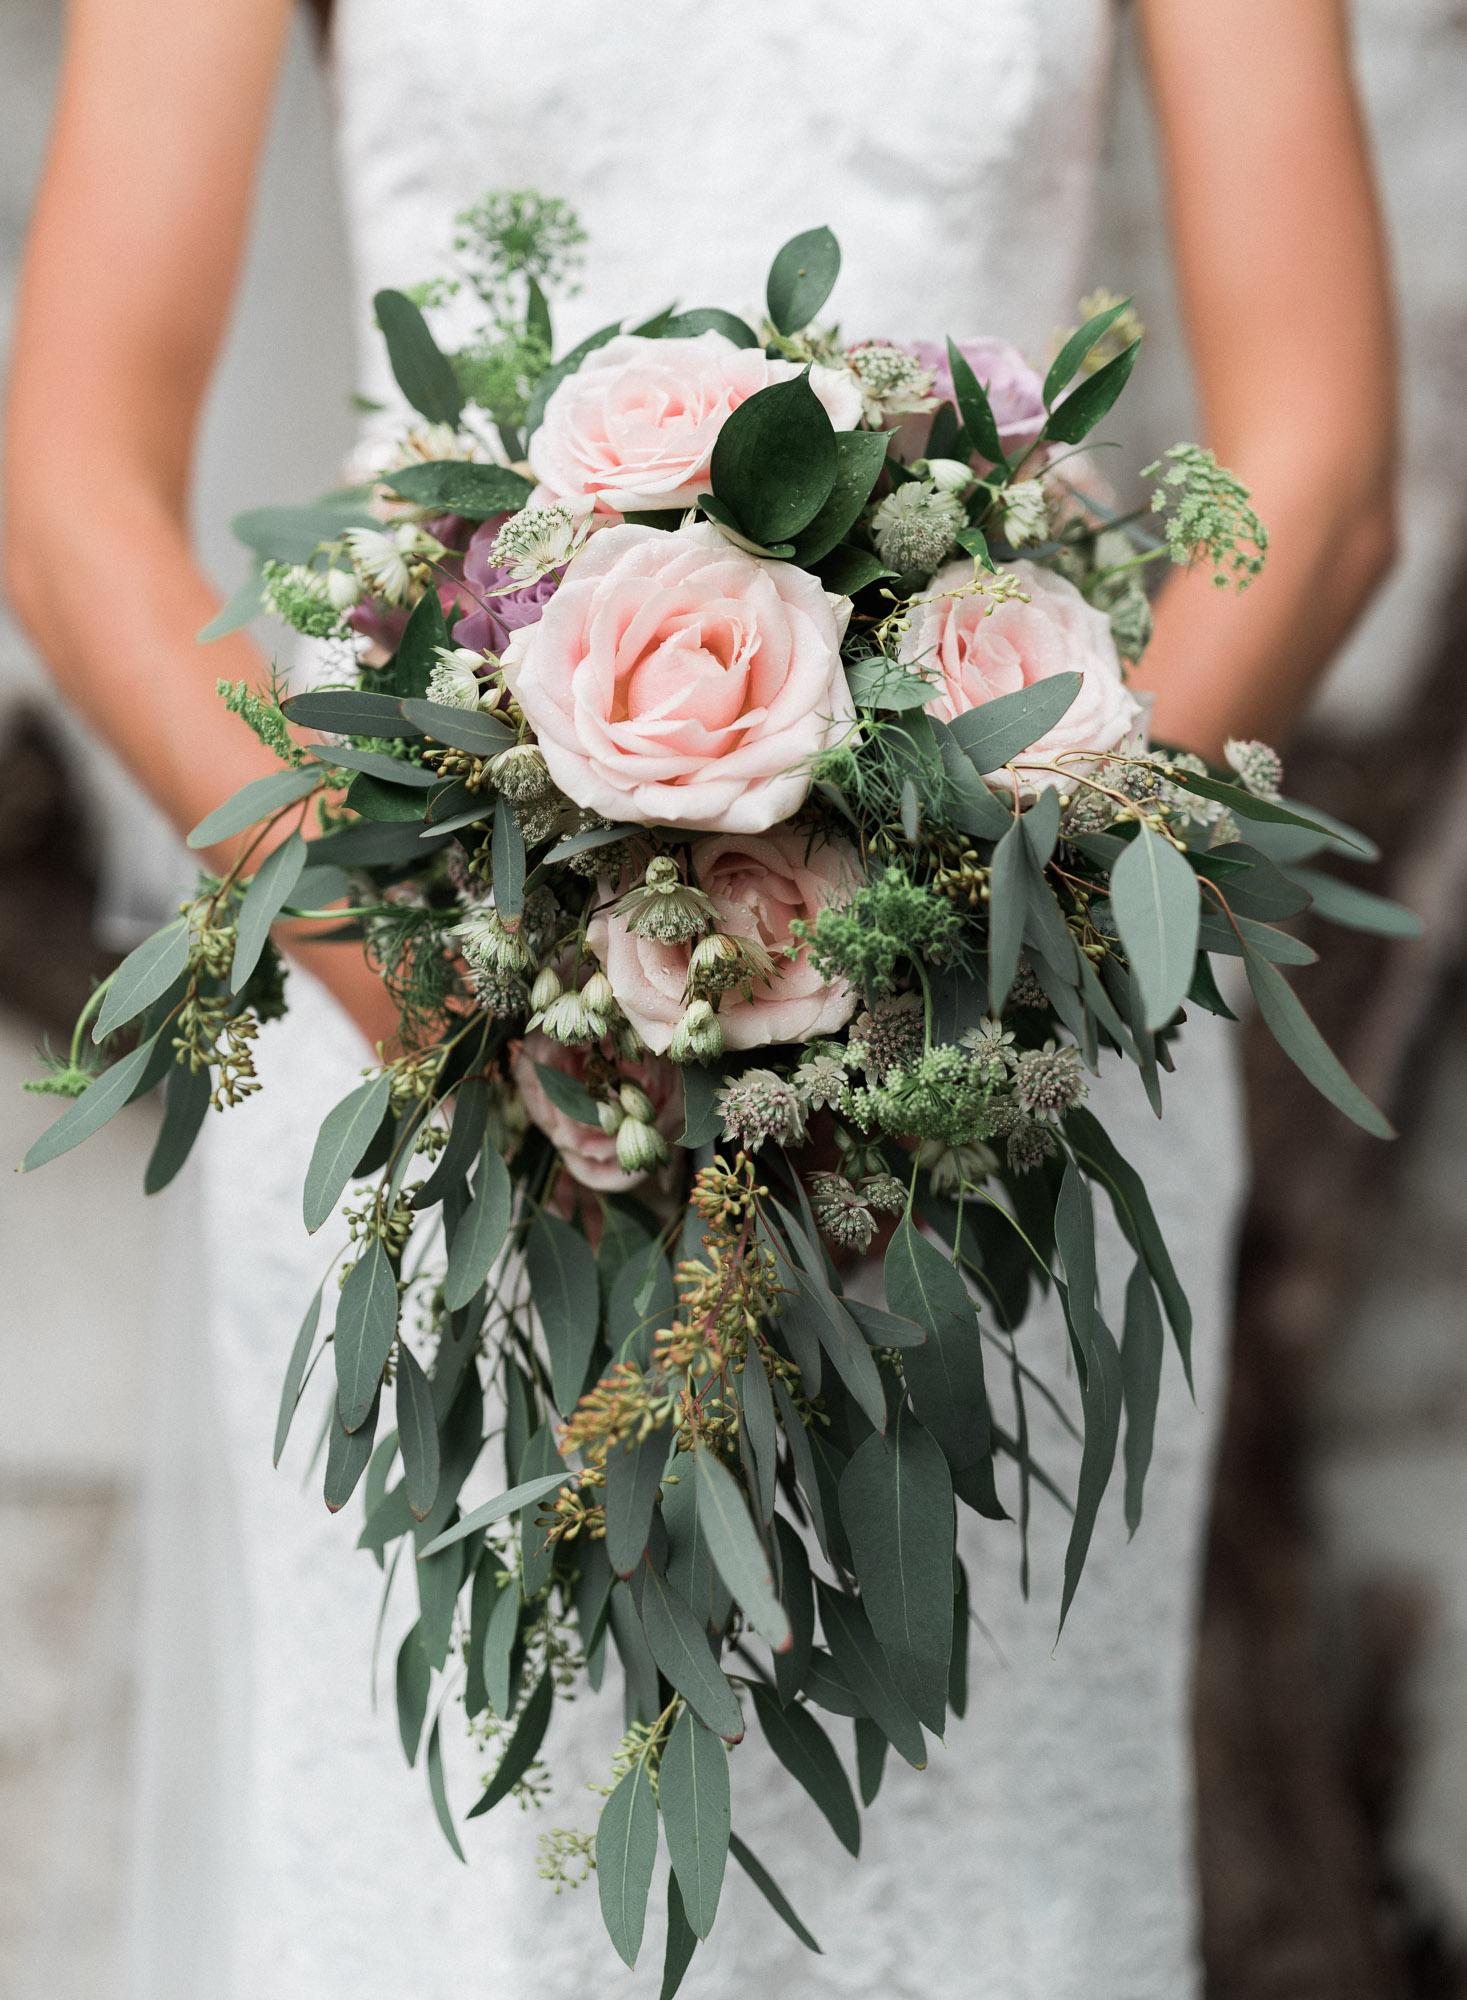 scottish_wedding_blairquhan_castle-52.jpg